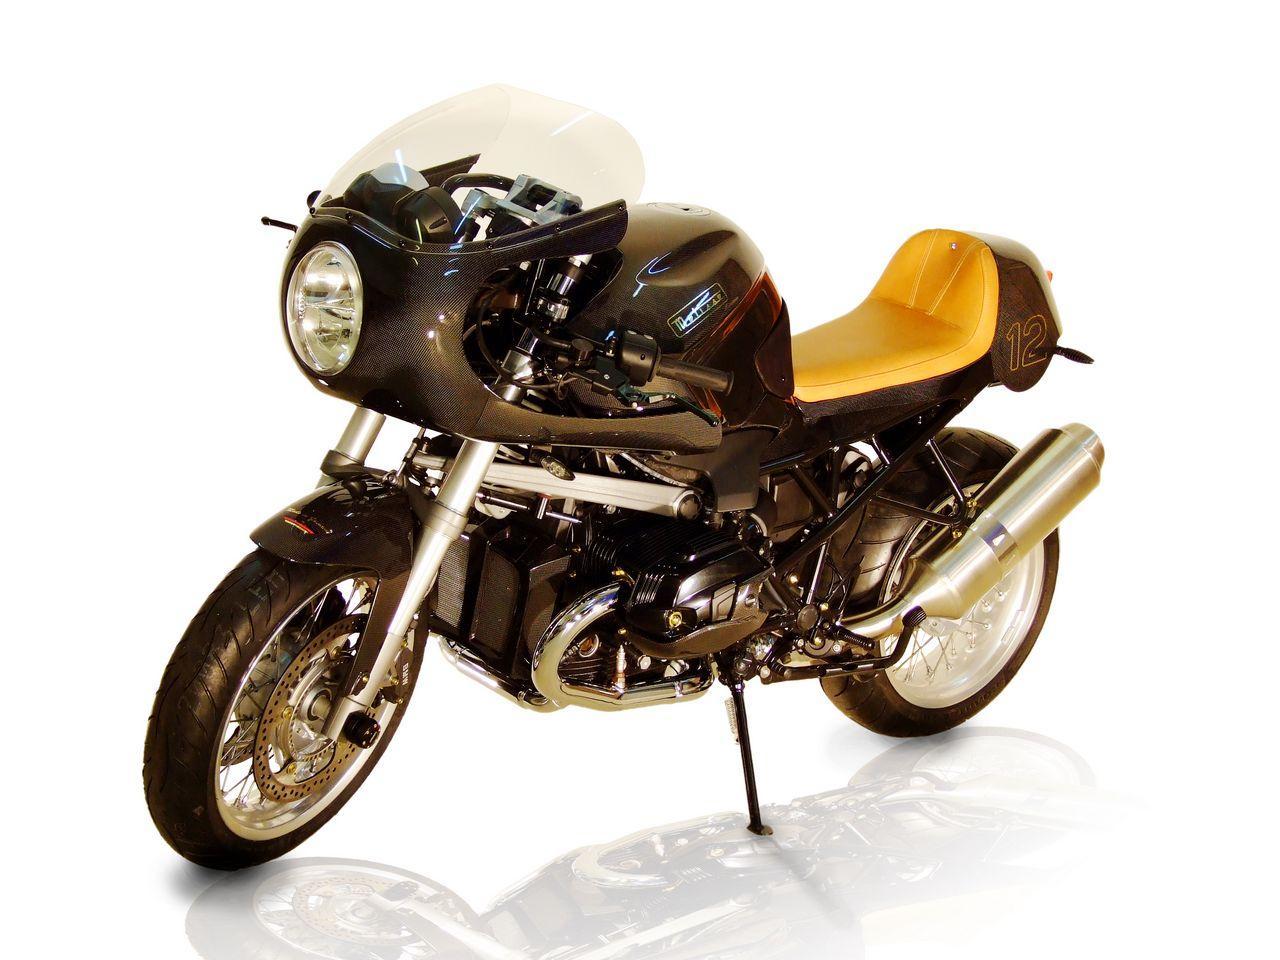 racing caf bmw r 1200 cr classic racer by m tisse. Black Bedroom Furniture Sets. Home Design Ideas